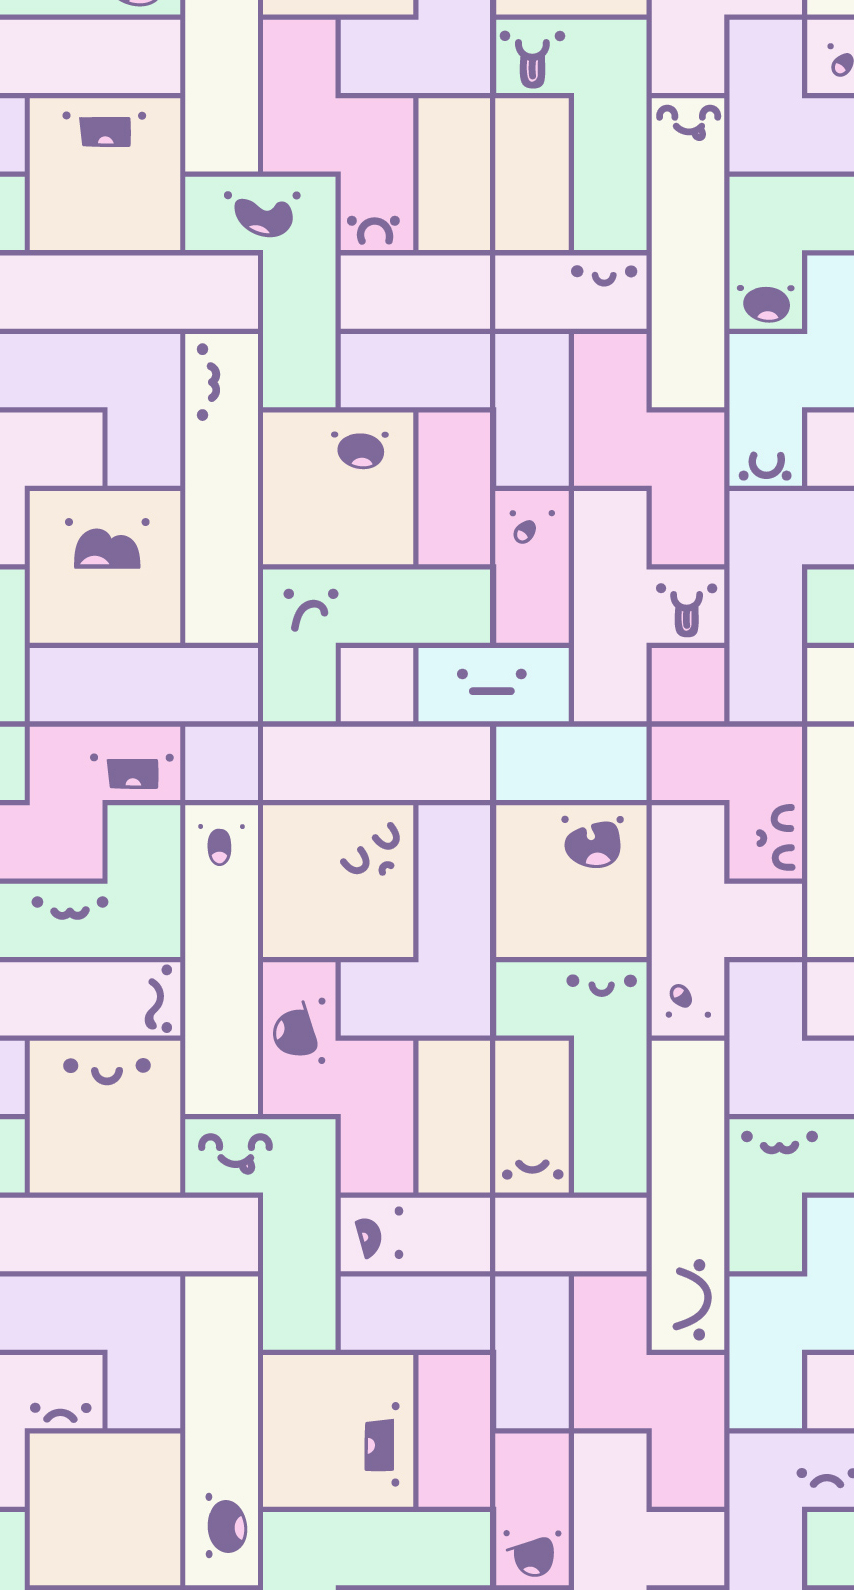 area, rectangle